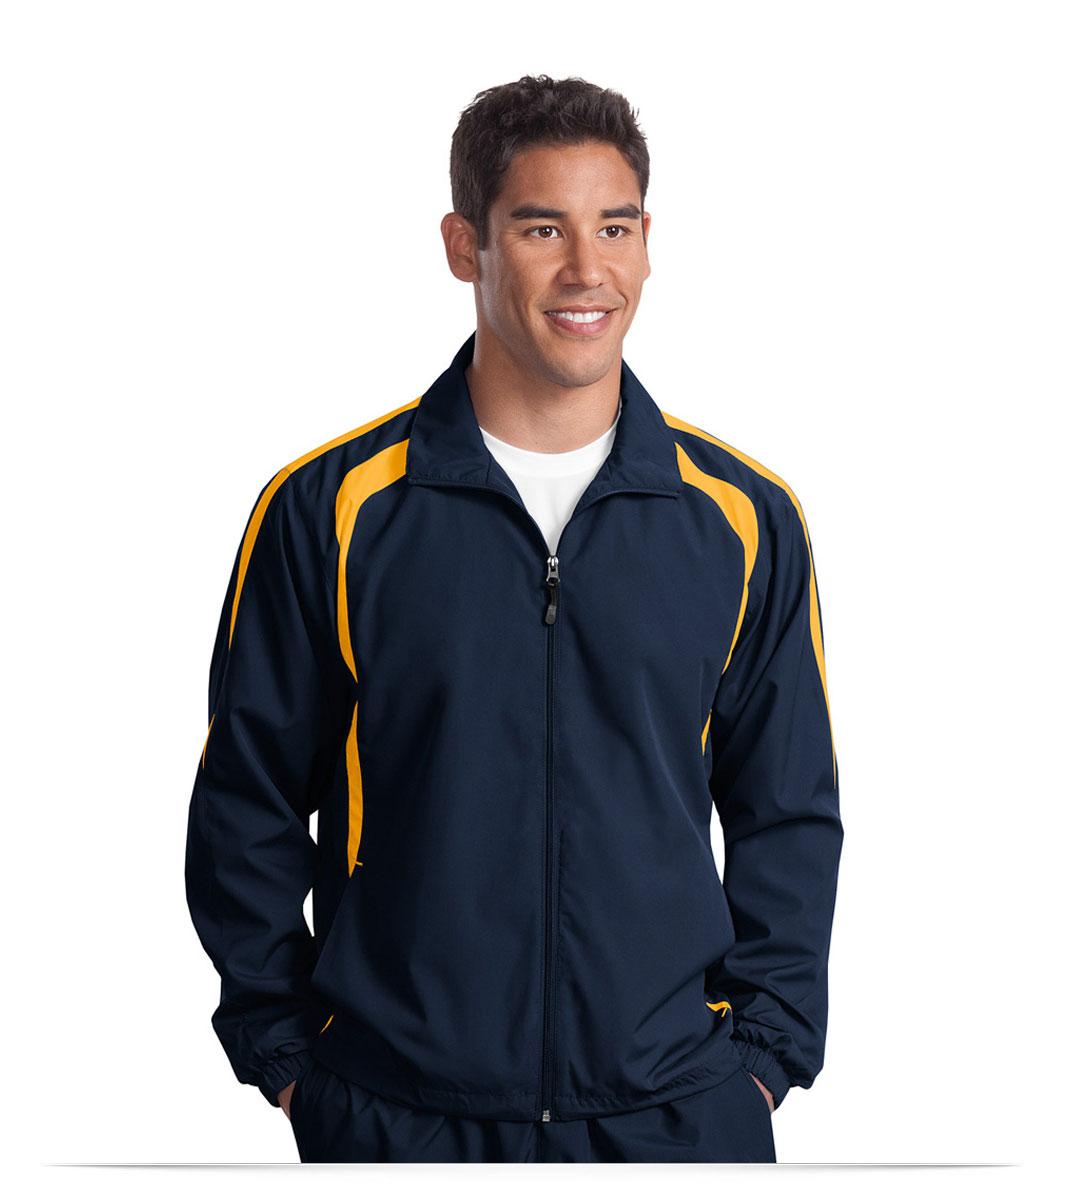 Personalized Logo Personalized Coach Jacket